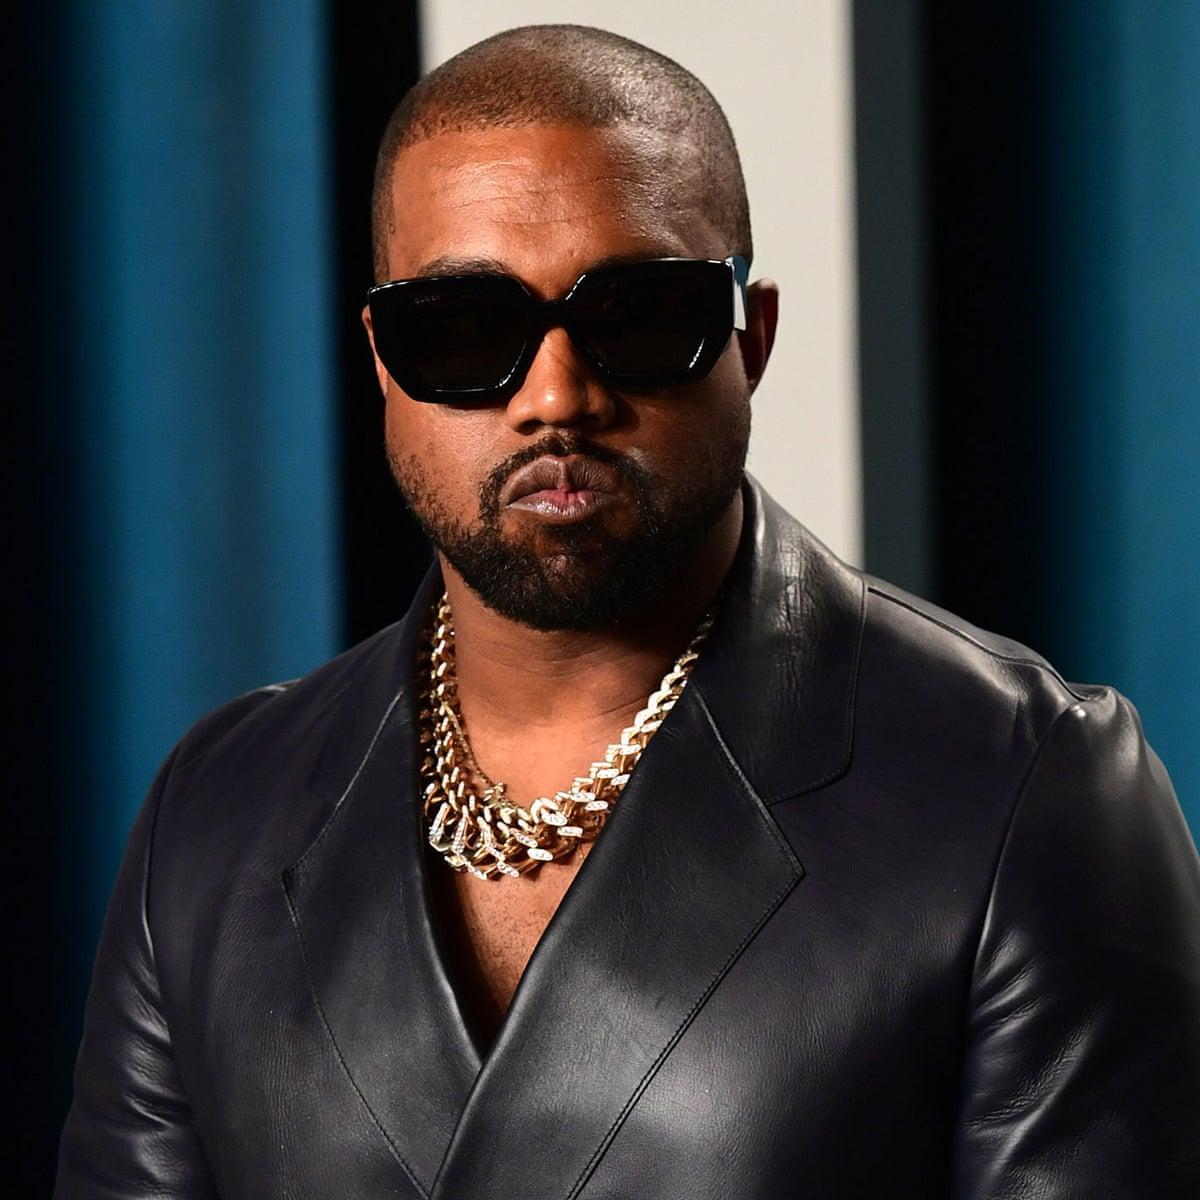 forbes-list-2021-black-billionaires-style-rave